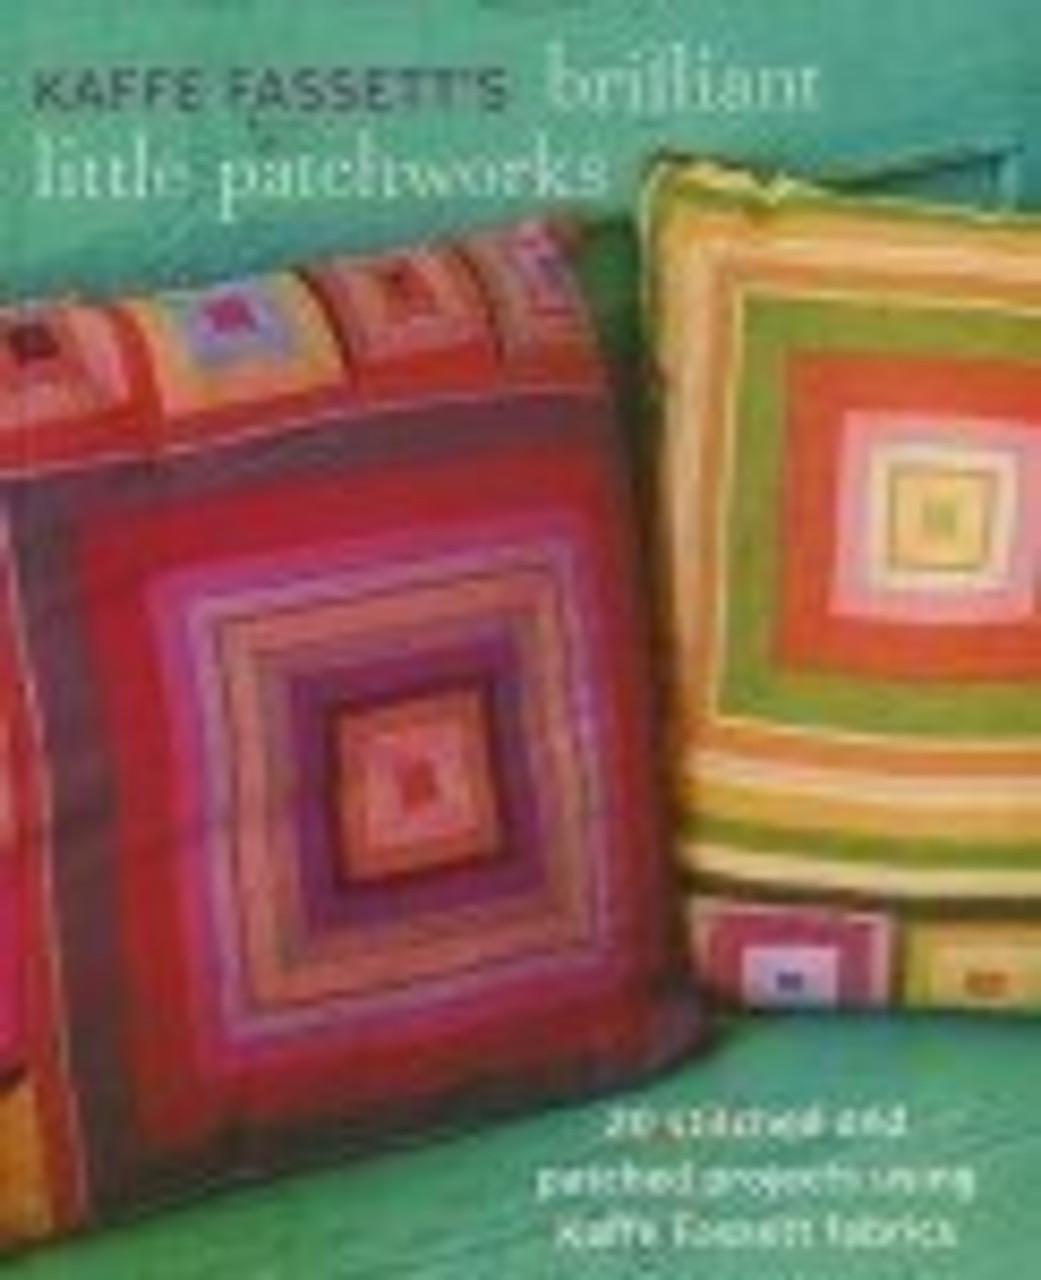 Kaffe Fassetts Brilliant Little Patchwork Book